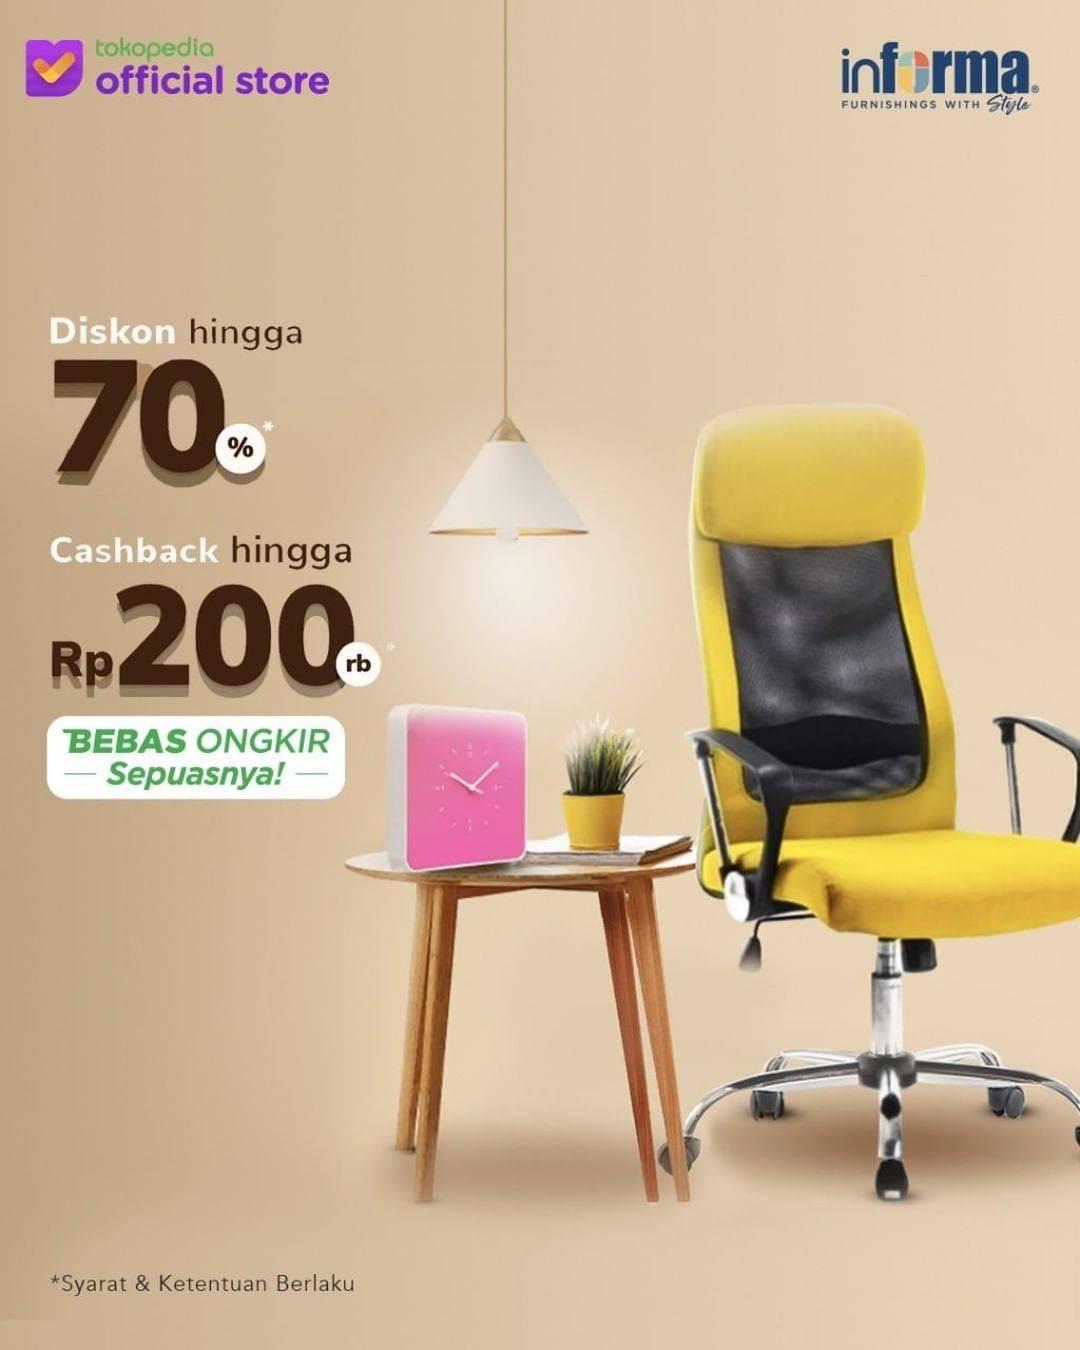 Diskon Informa Promo Diskon Hingga 70% + Cashback Hingga Rp. 200.000 Setiap Belanja Di Informa Tokopedia